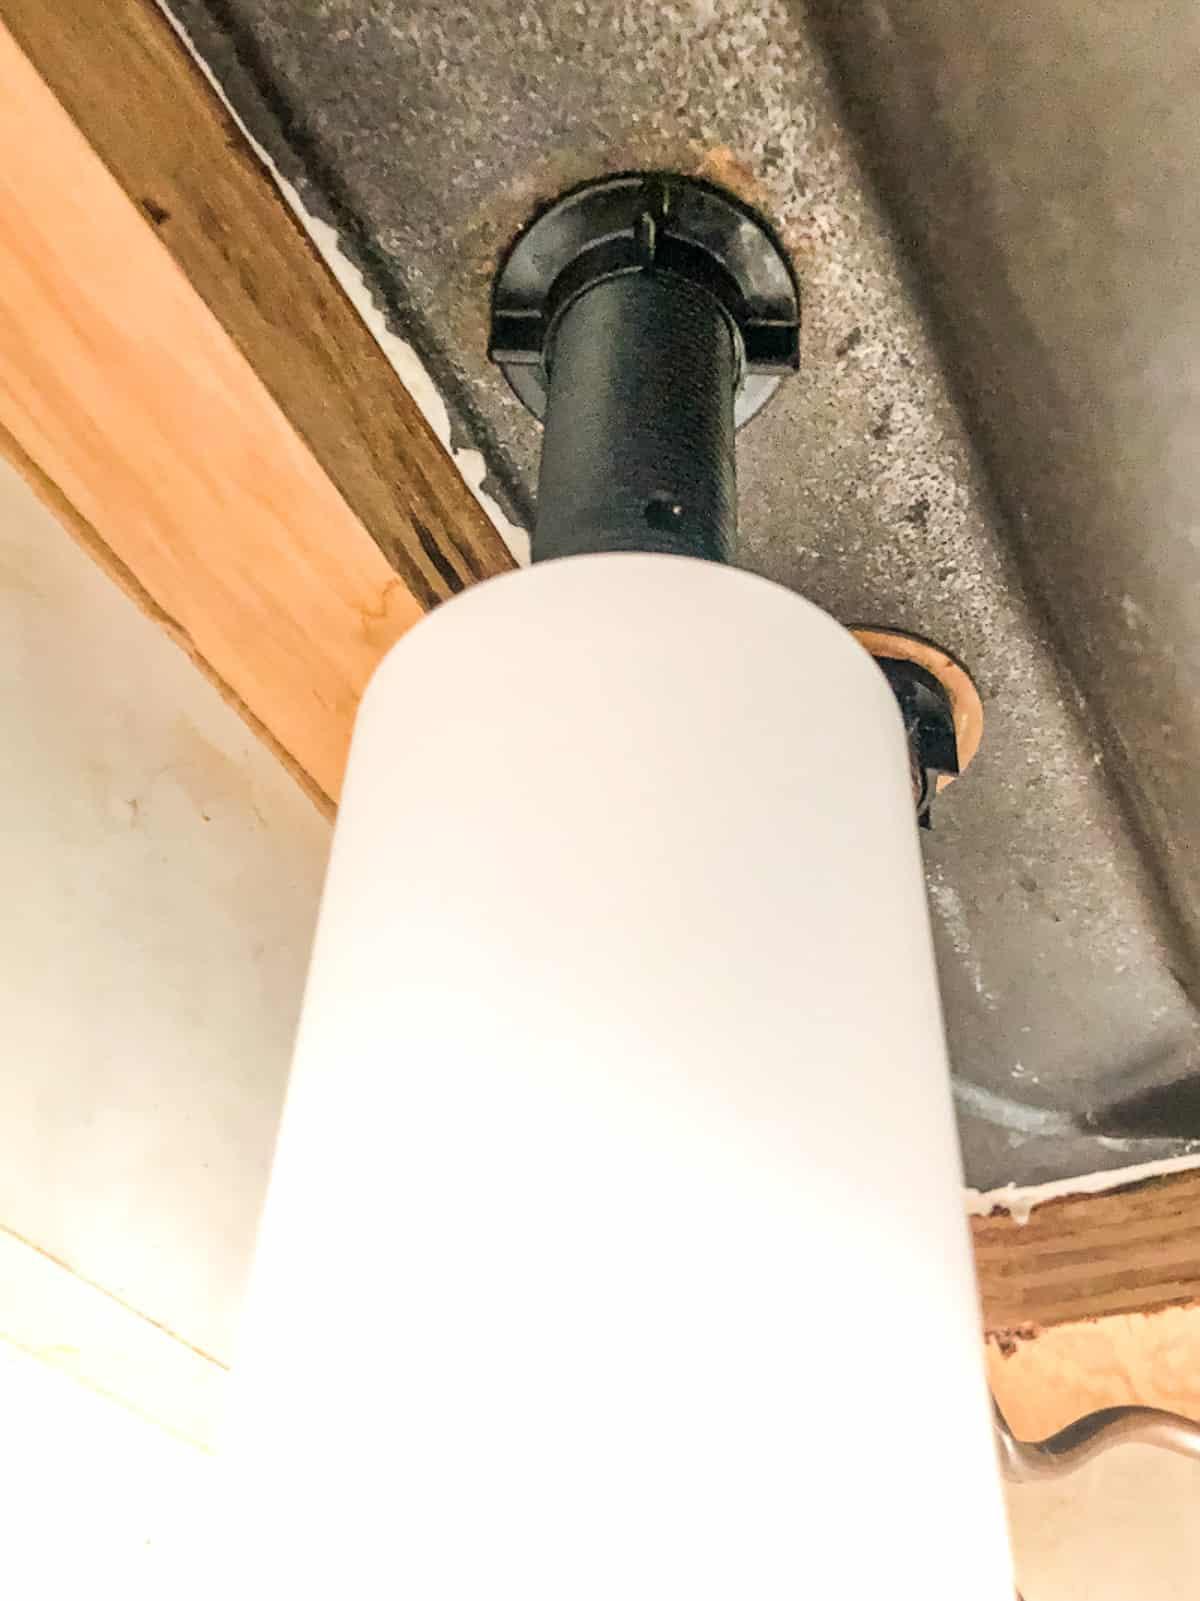 built-in soap dispenser bottle under sink